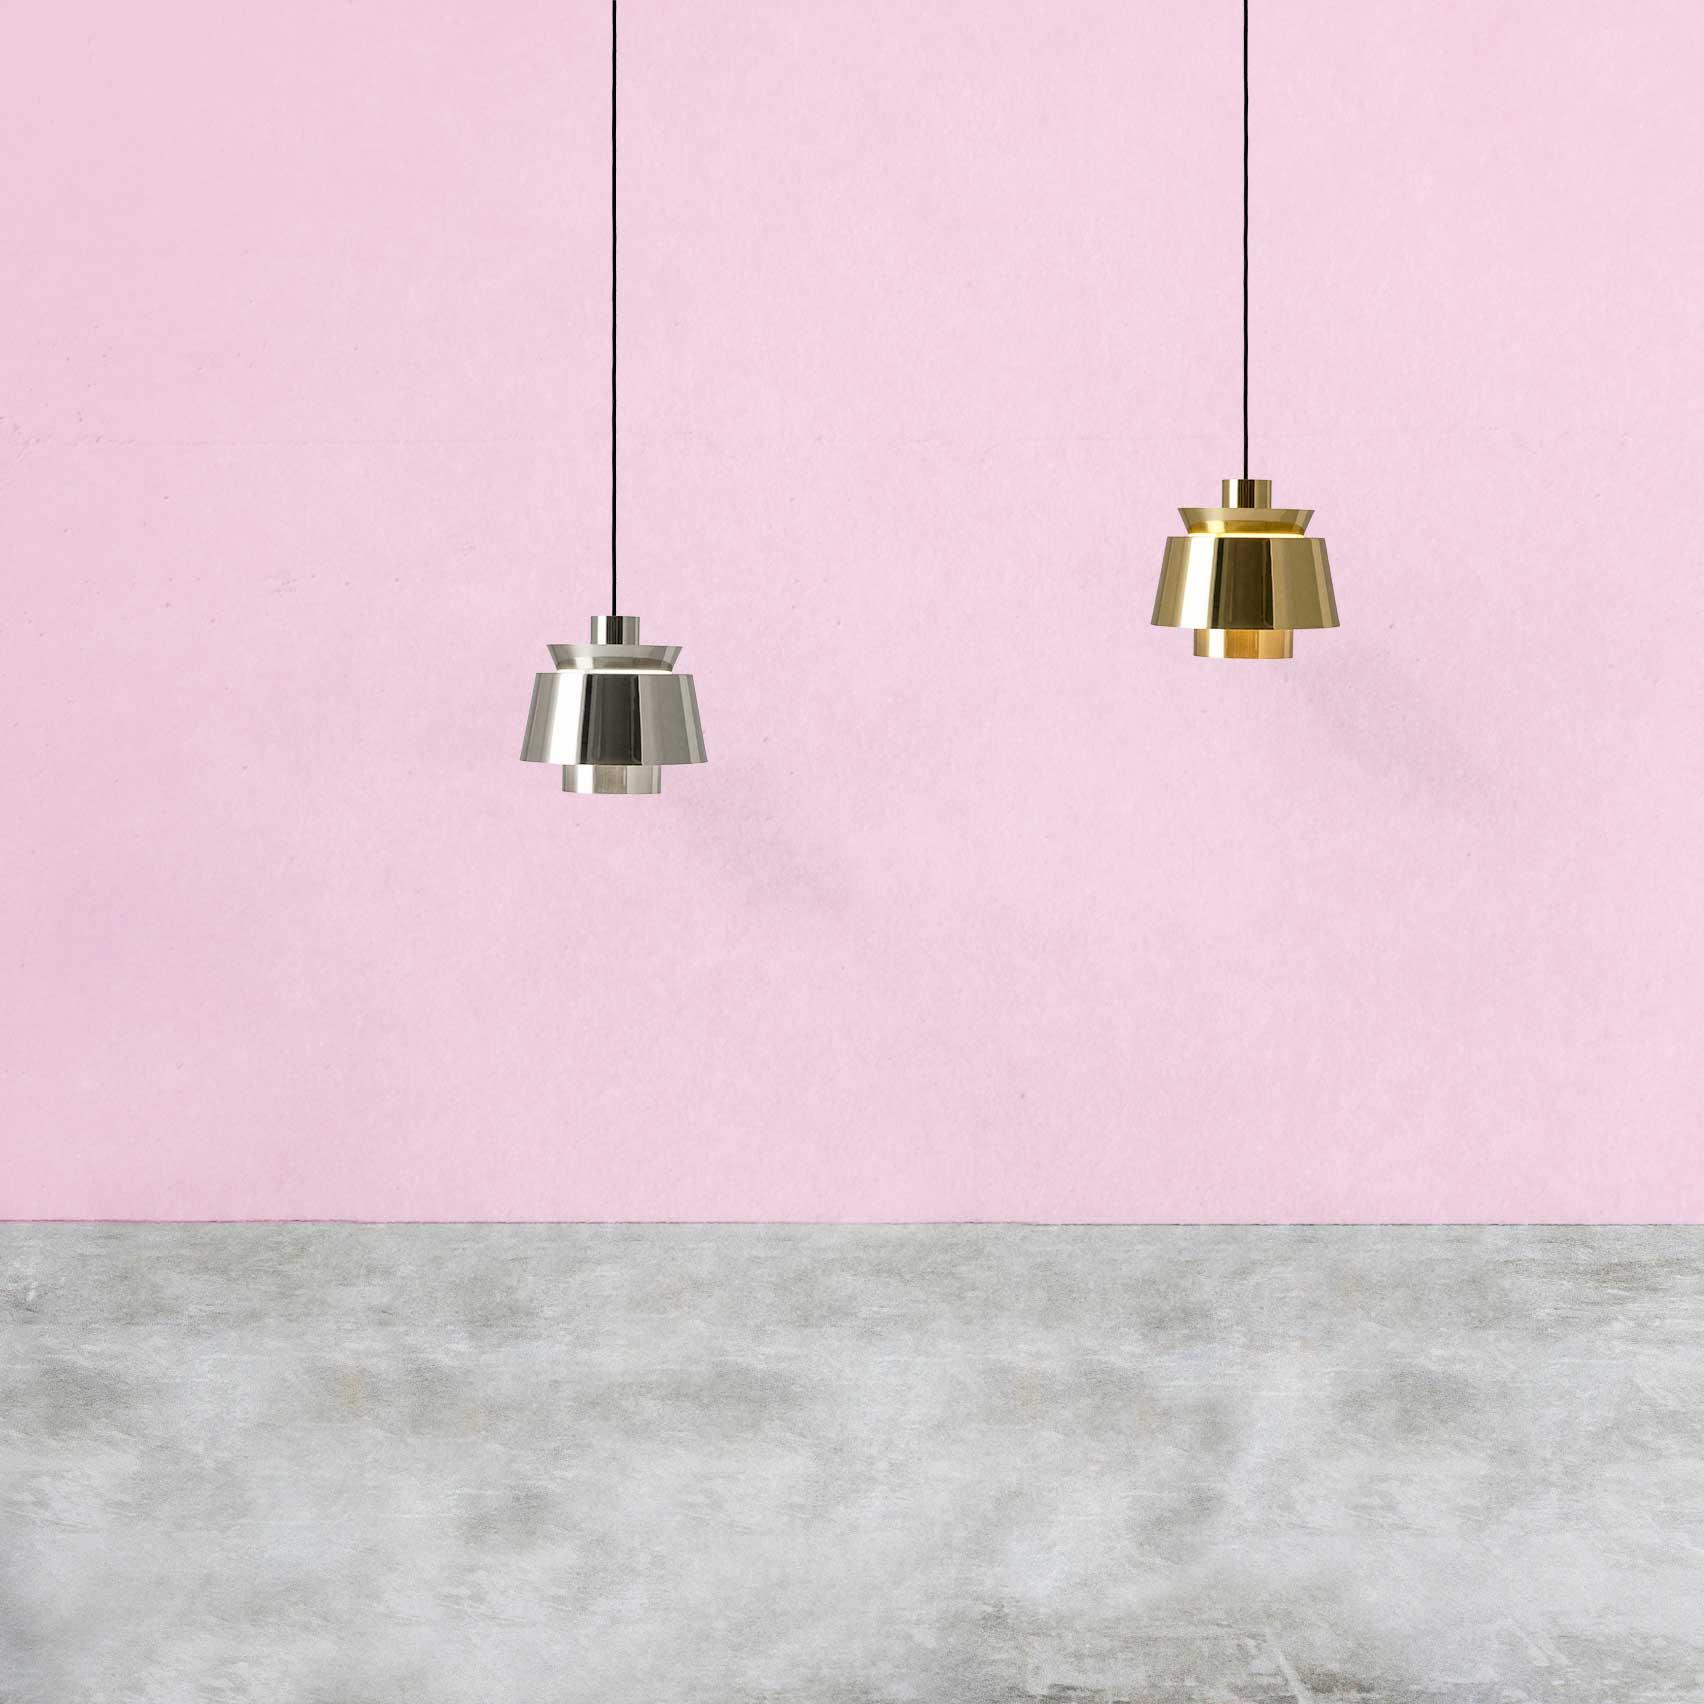 _and-tradition-LE_MILE_Magazine_LE_MILE_SeLECTED_European_Furniture_Design_2018.jpg